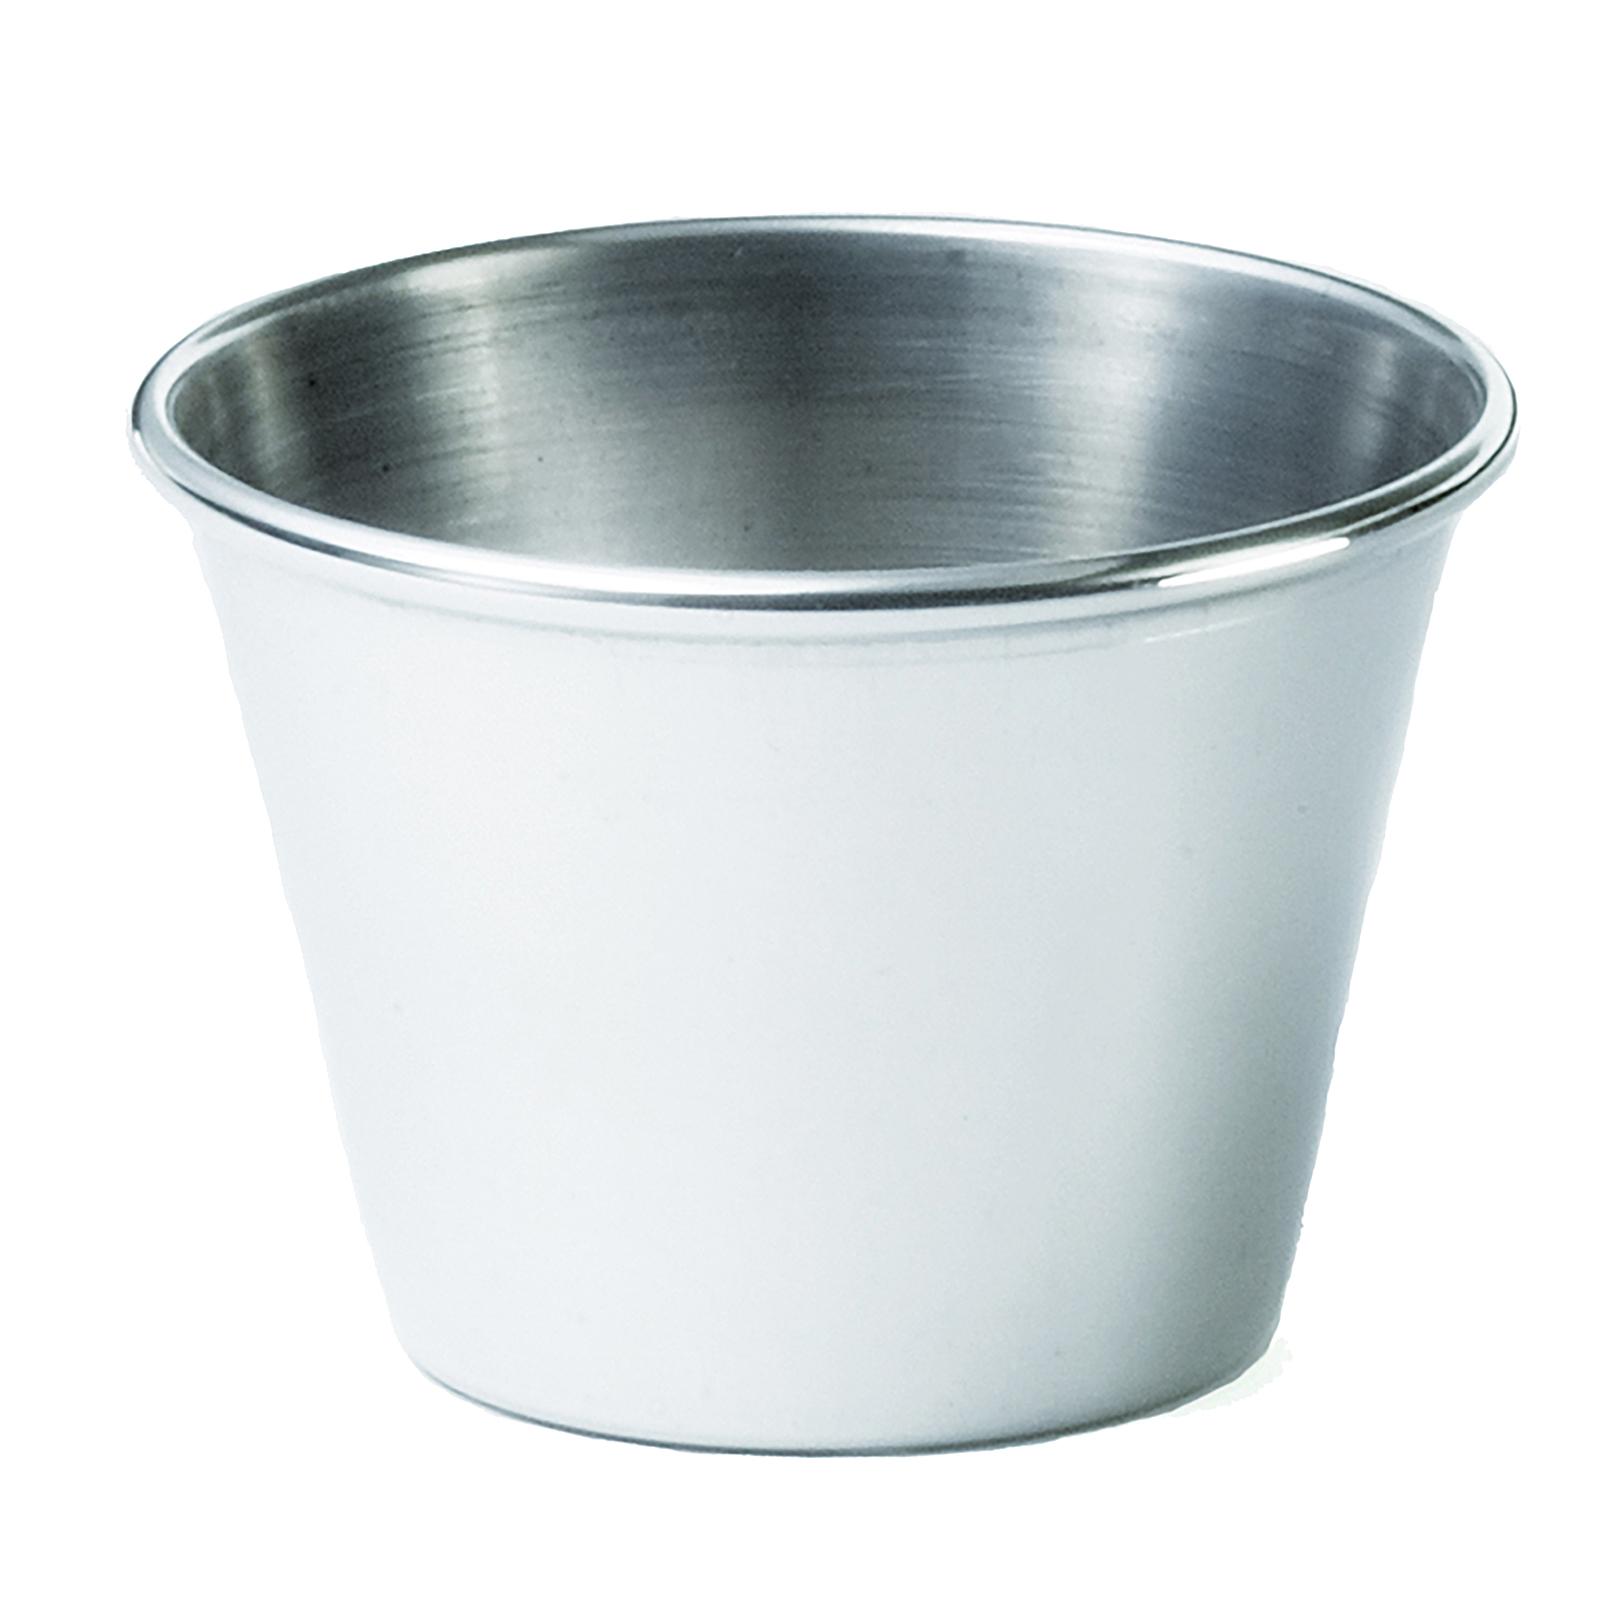 TableCraft Products C5067 ramekin / sauce cup, metal